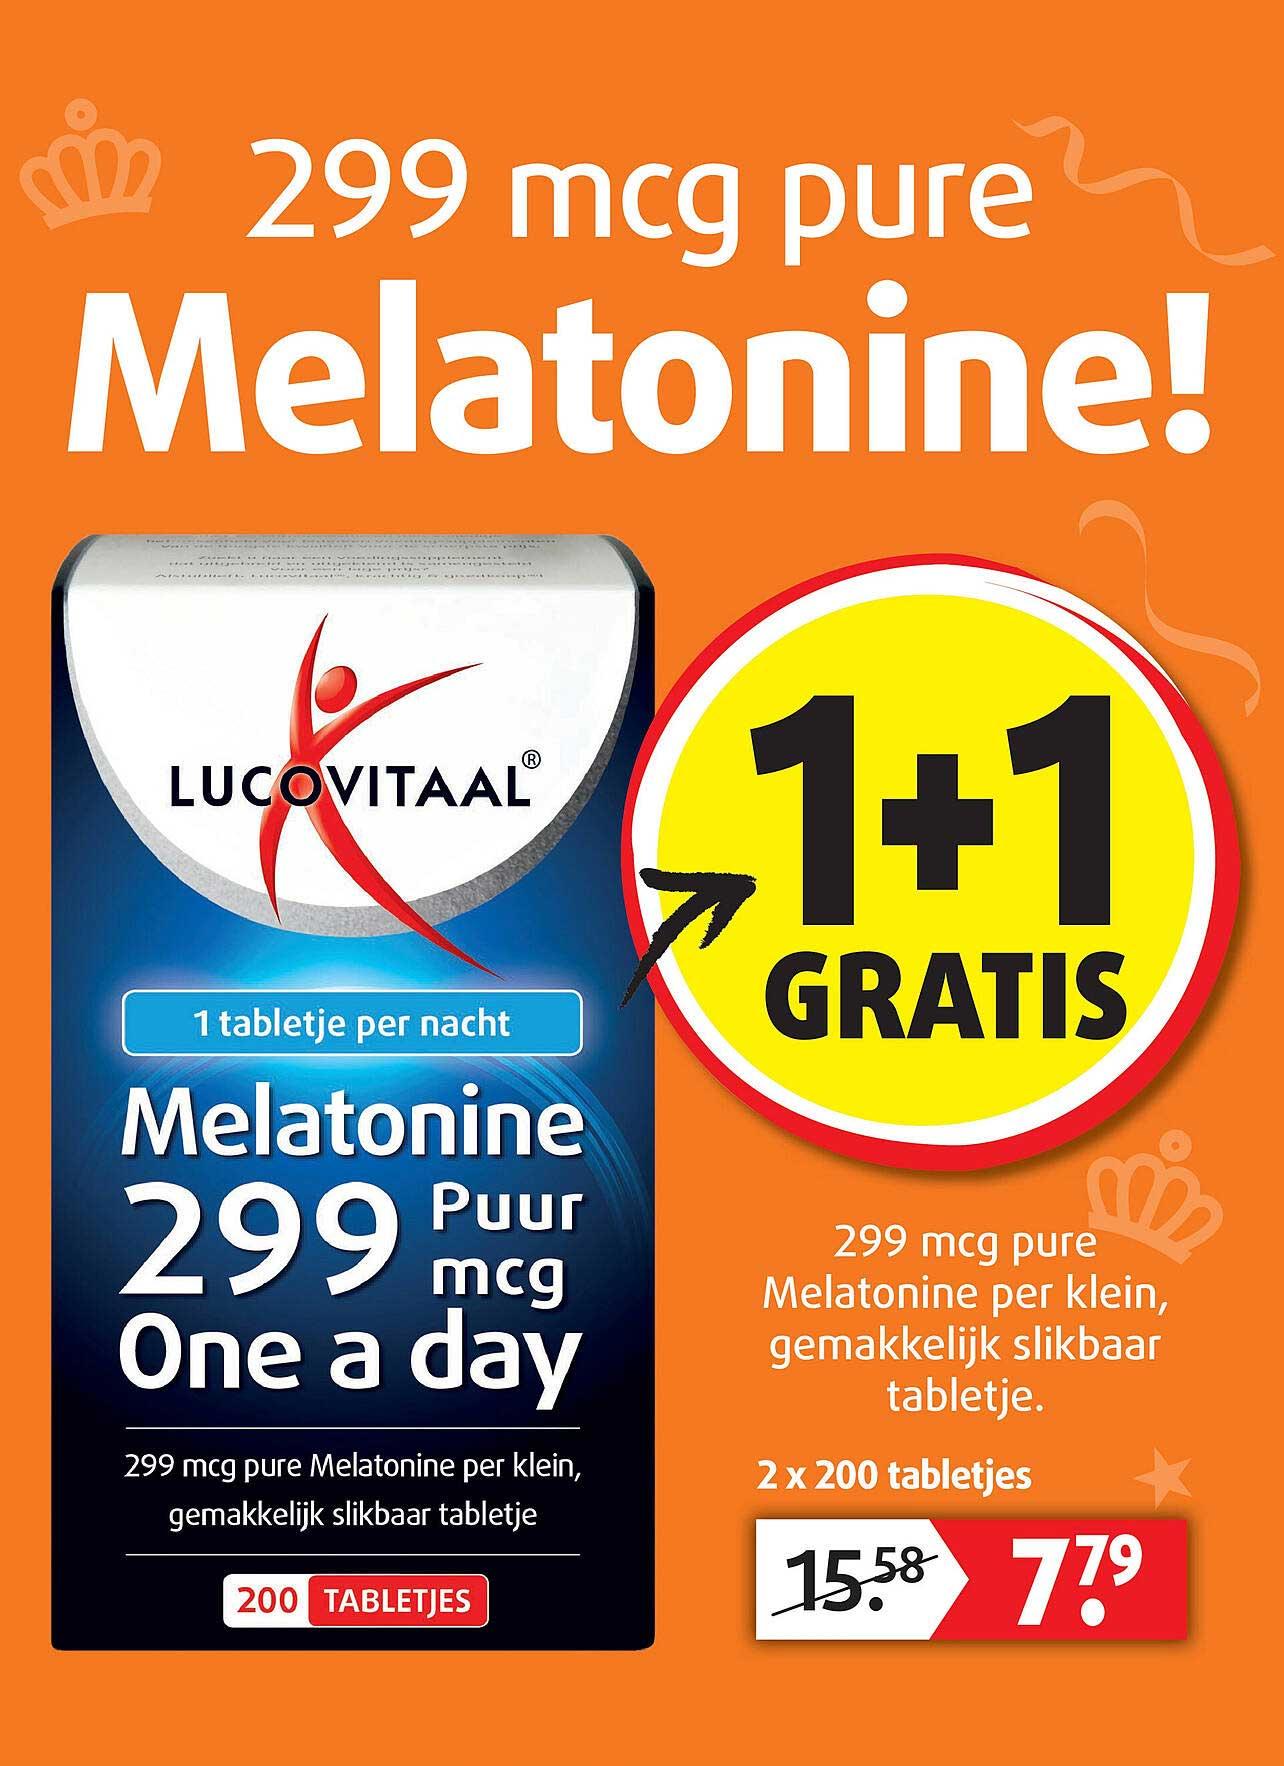 Lucovitaal Lucovitaal Melatonine 299 Puur Mcg One A Day 1+1 Gratis